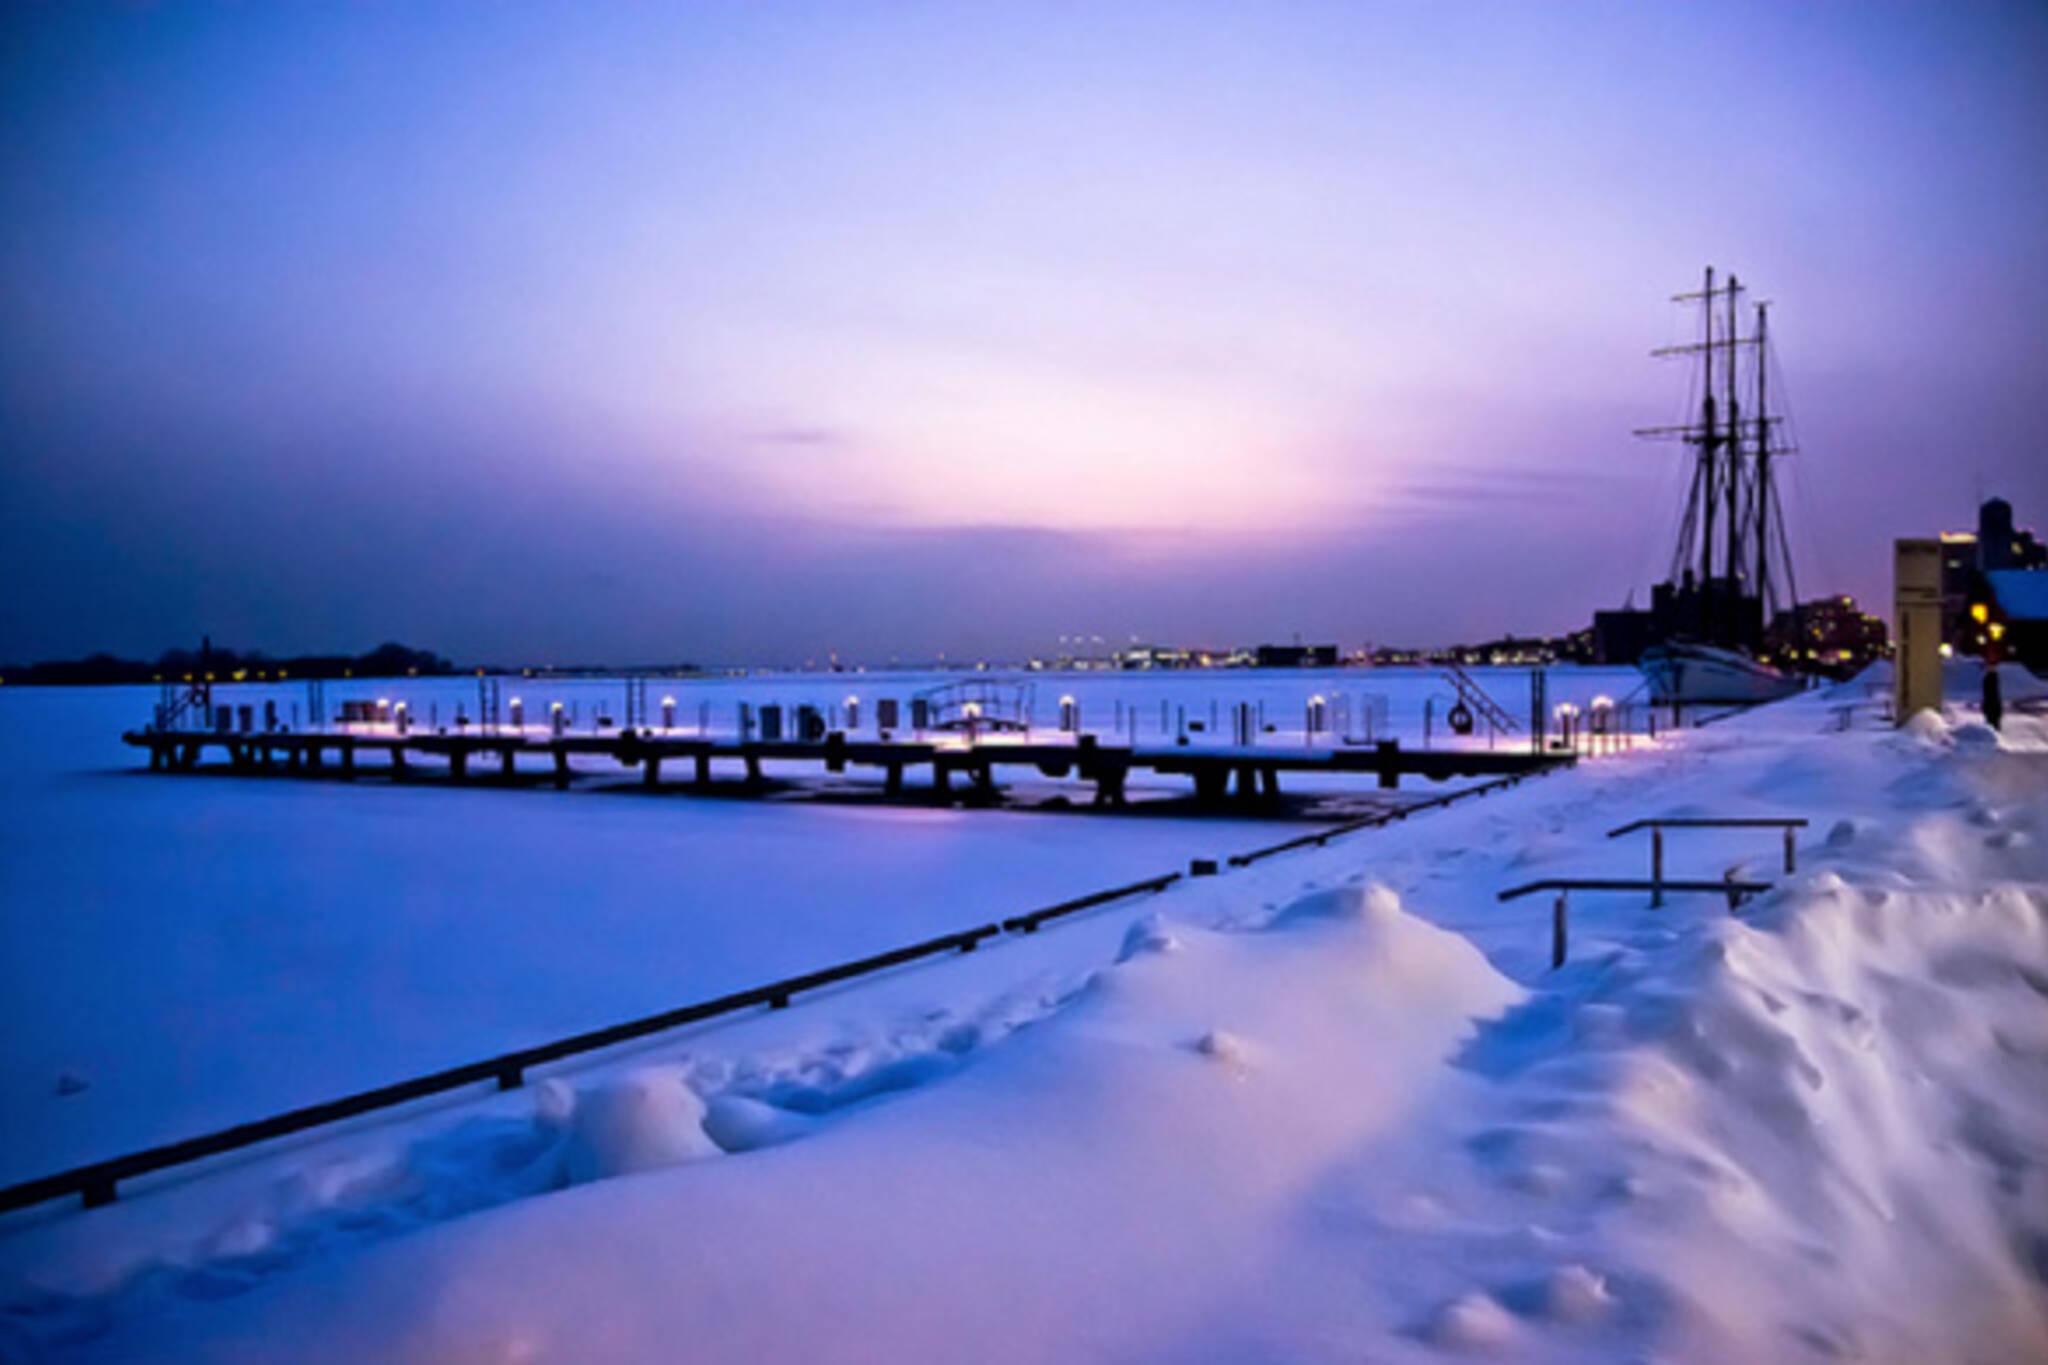 Sunset Toronto Bay